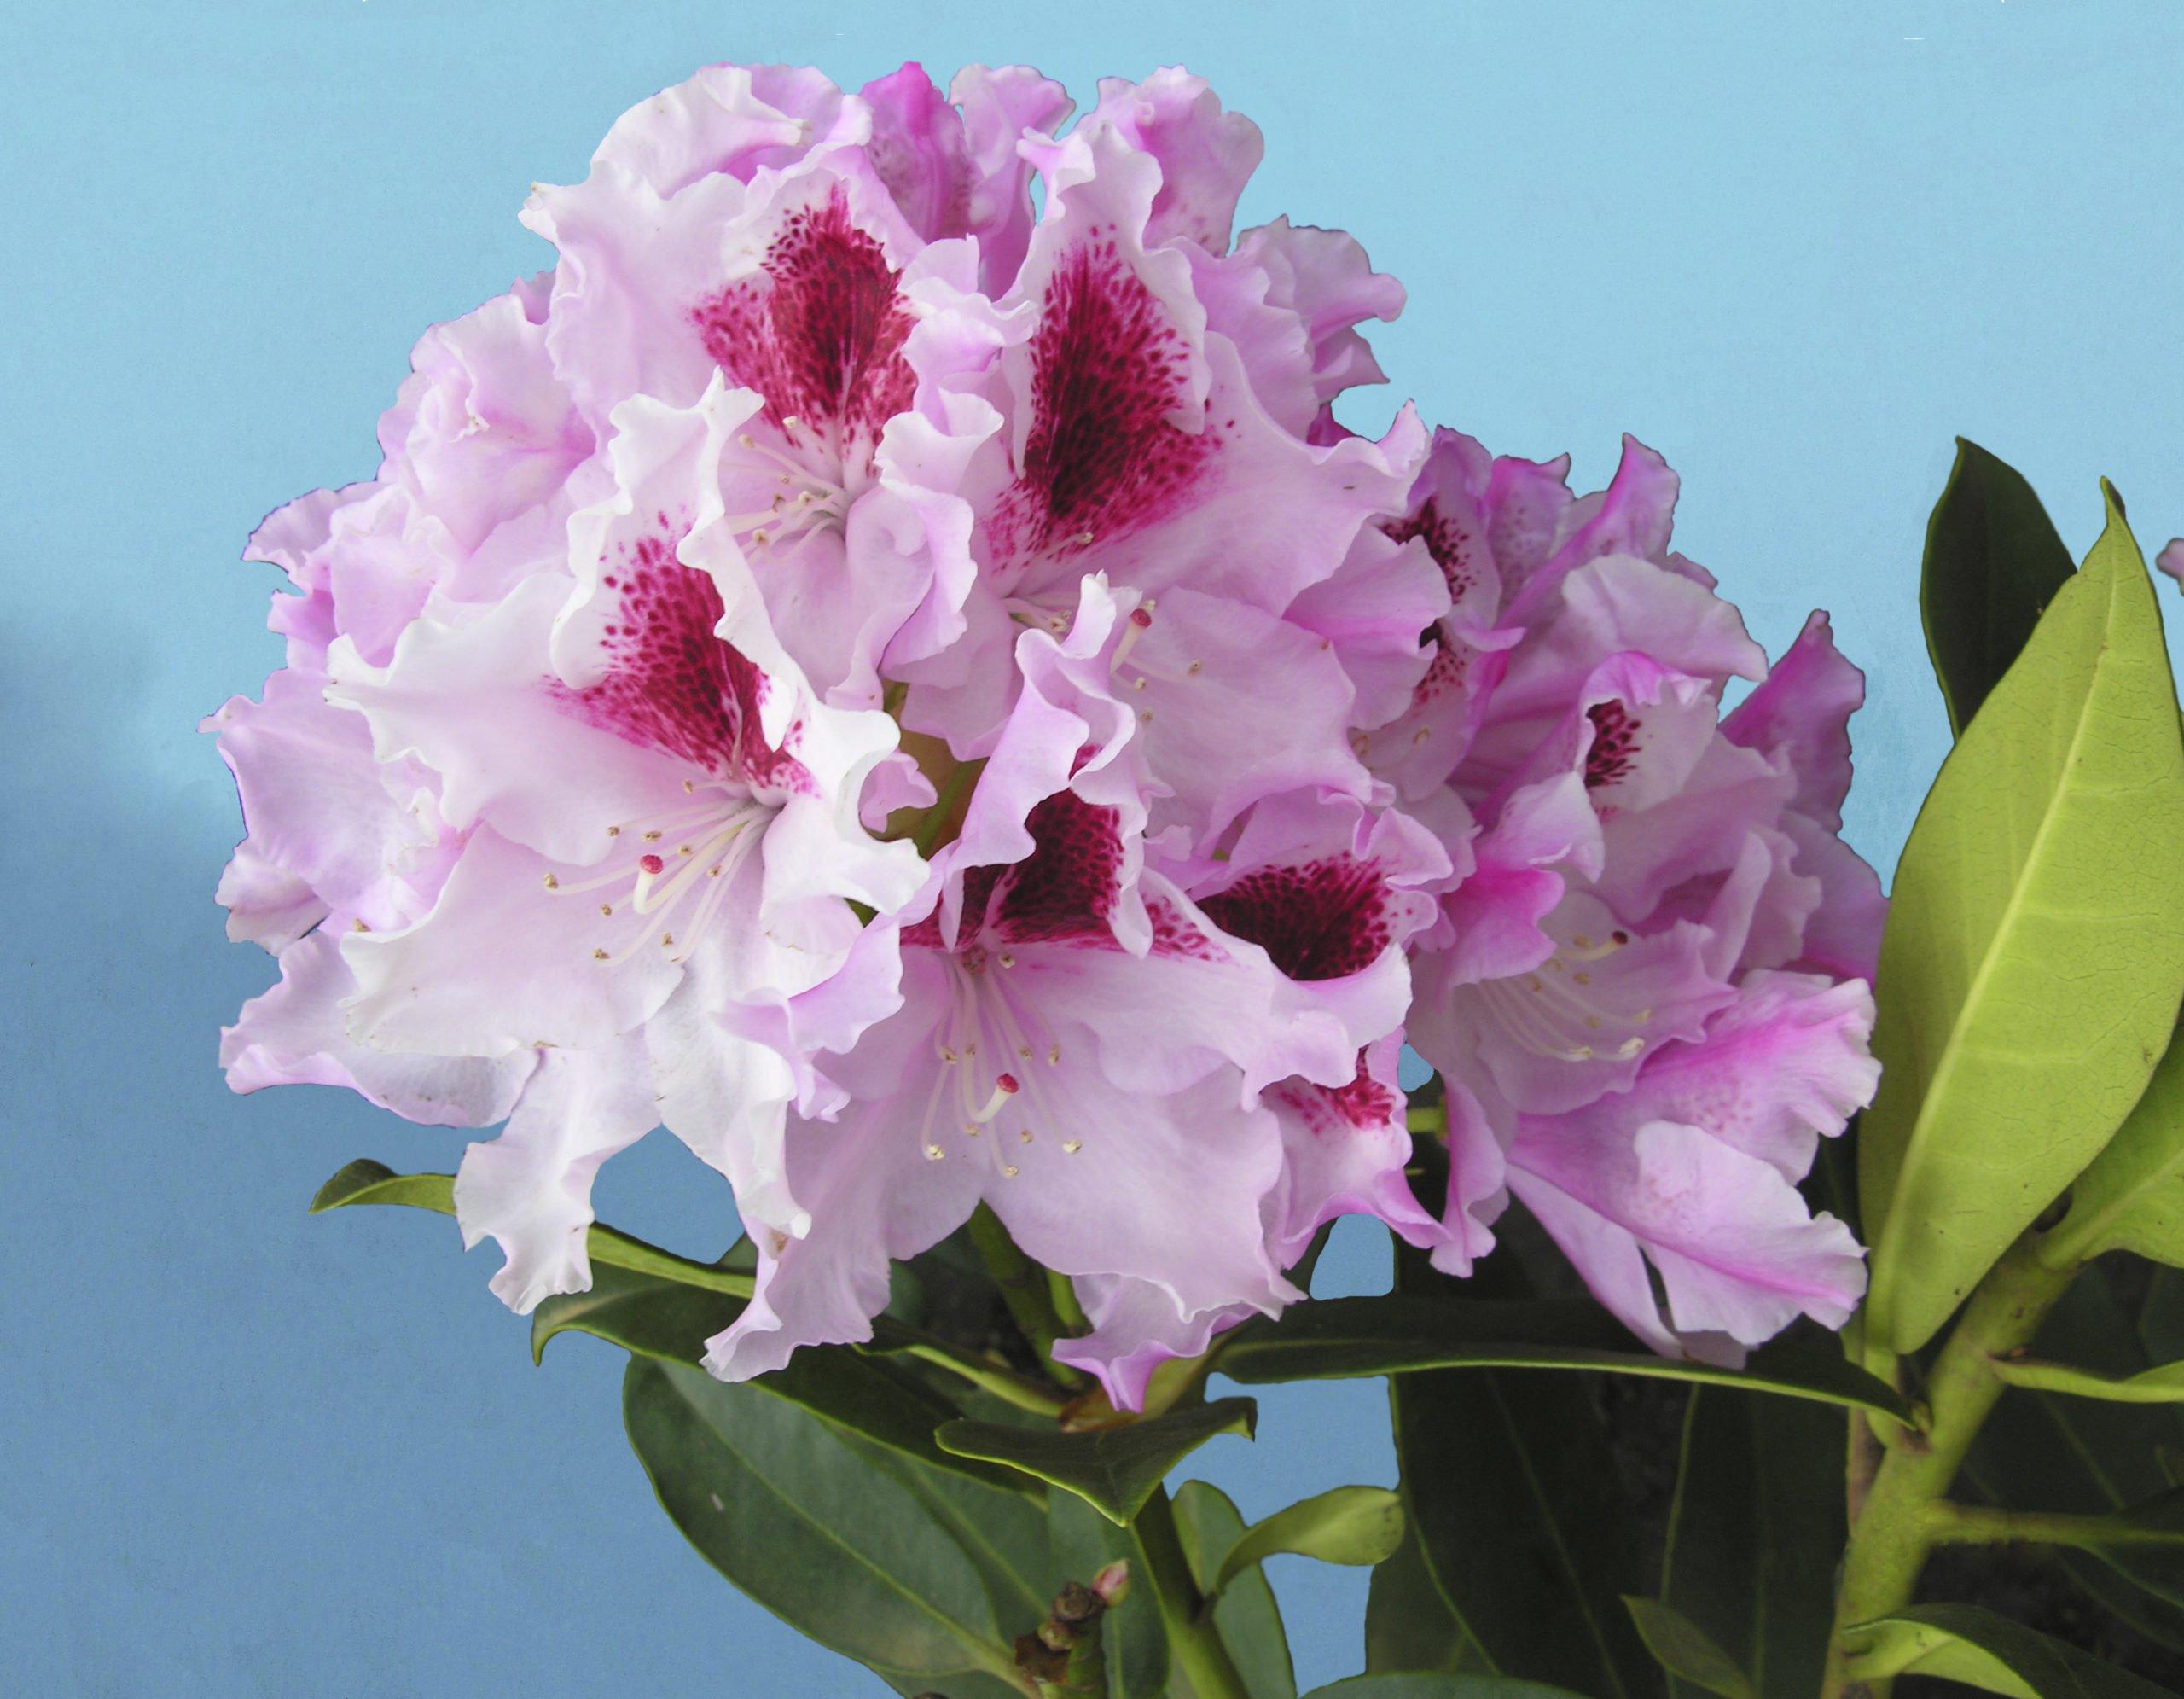 Rhododendron Royal Butterfly, alppiruusu